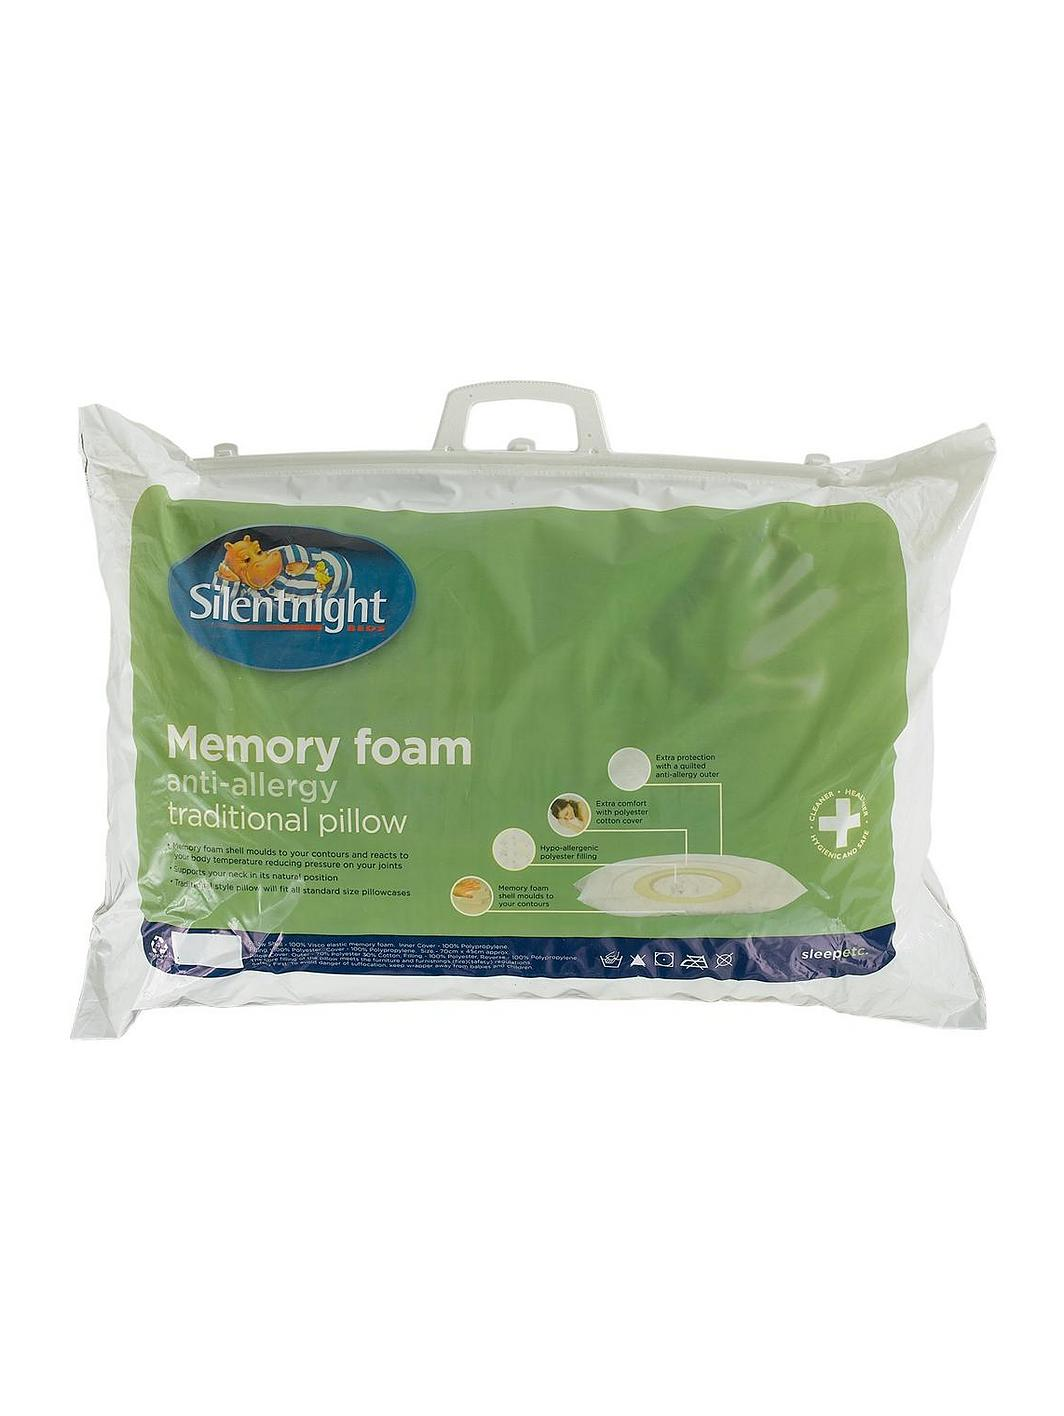 Silent Night Traditional Memory Foam Pillows : Silentnight Anti-Allergy Memory Foam Pillow very.co.uk